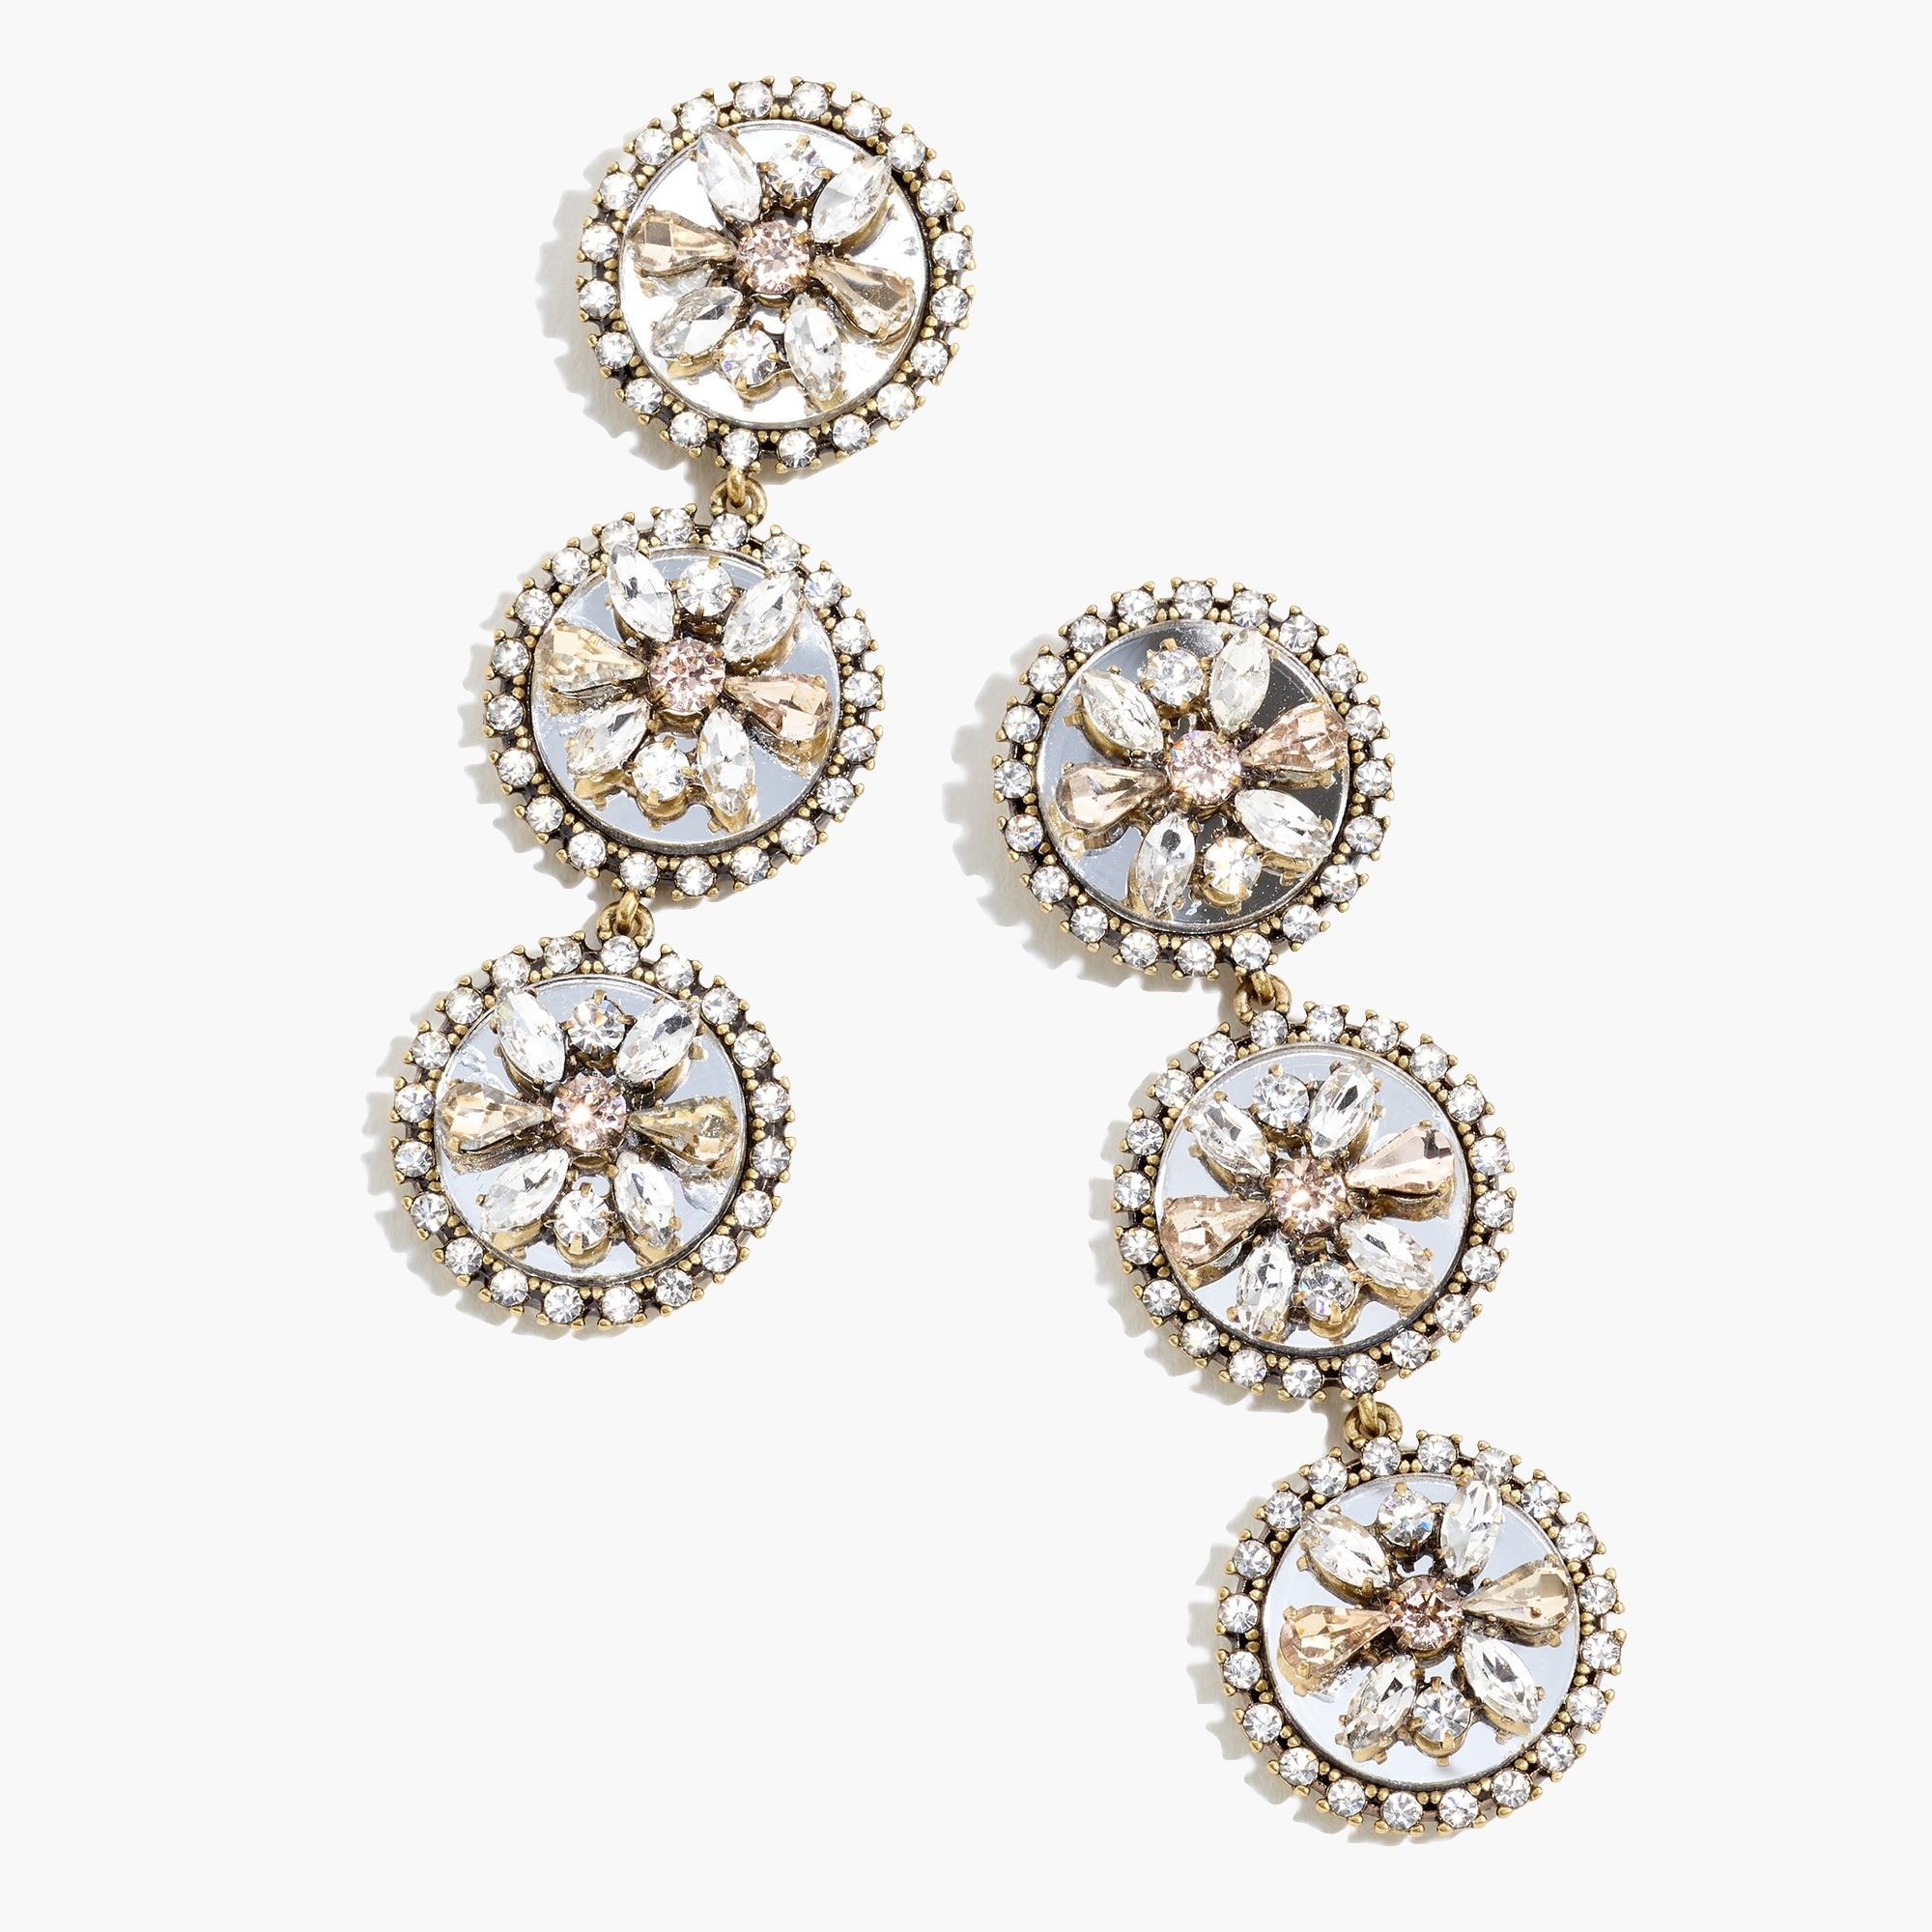 Crystal mirror statement earrings